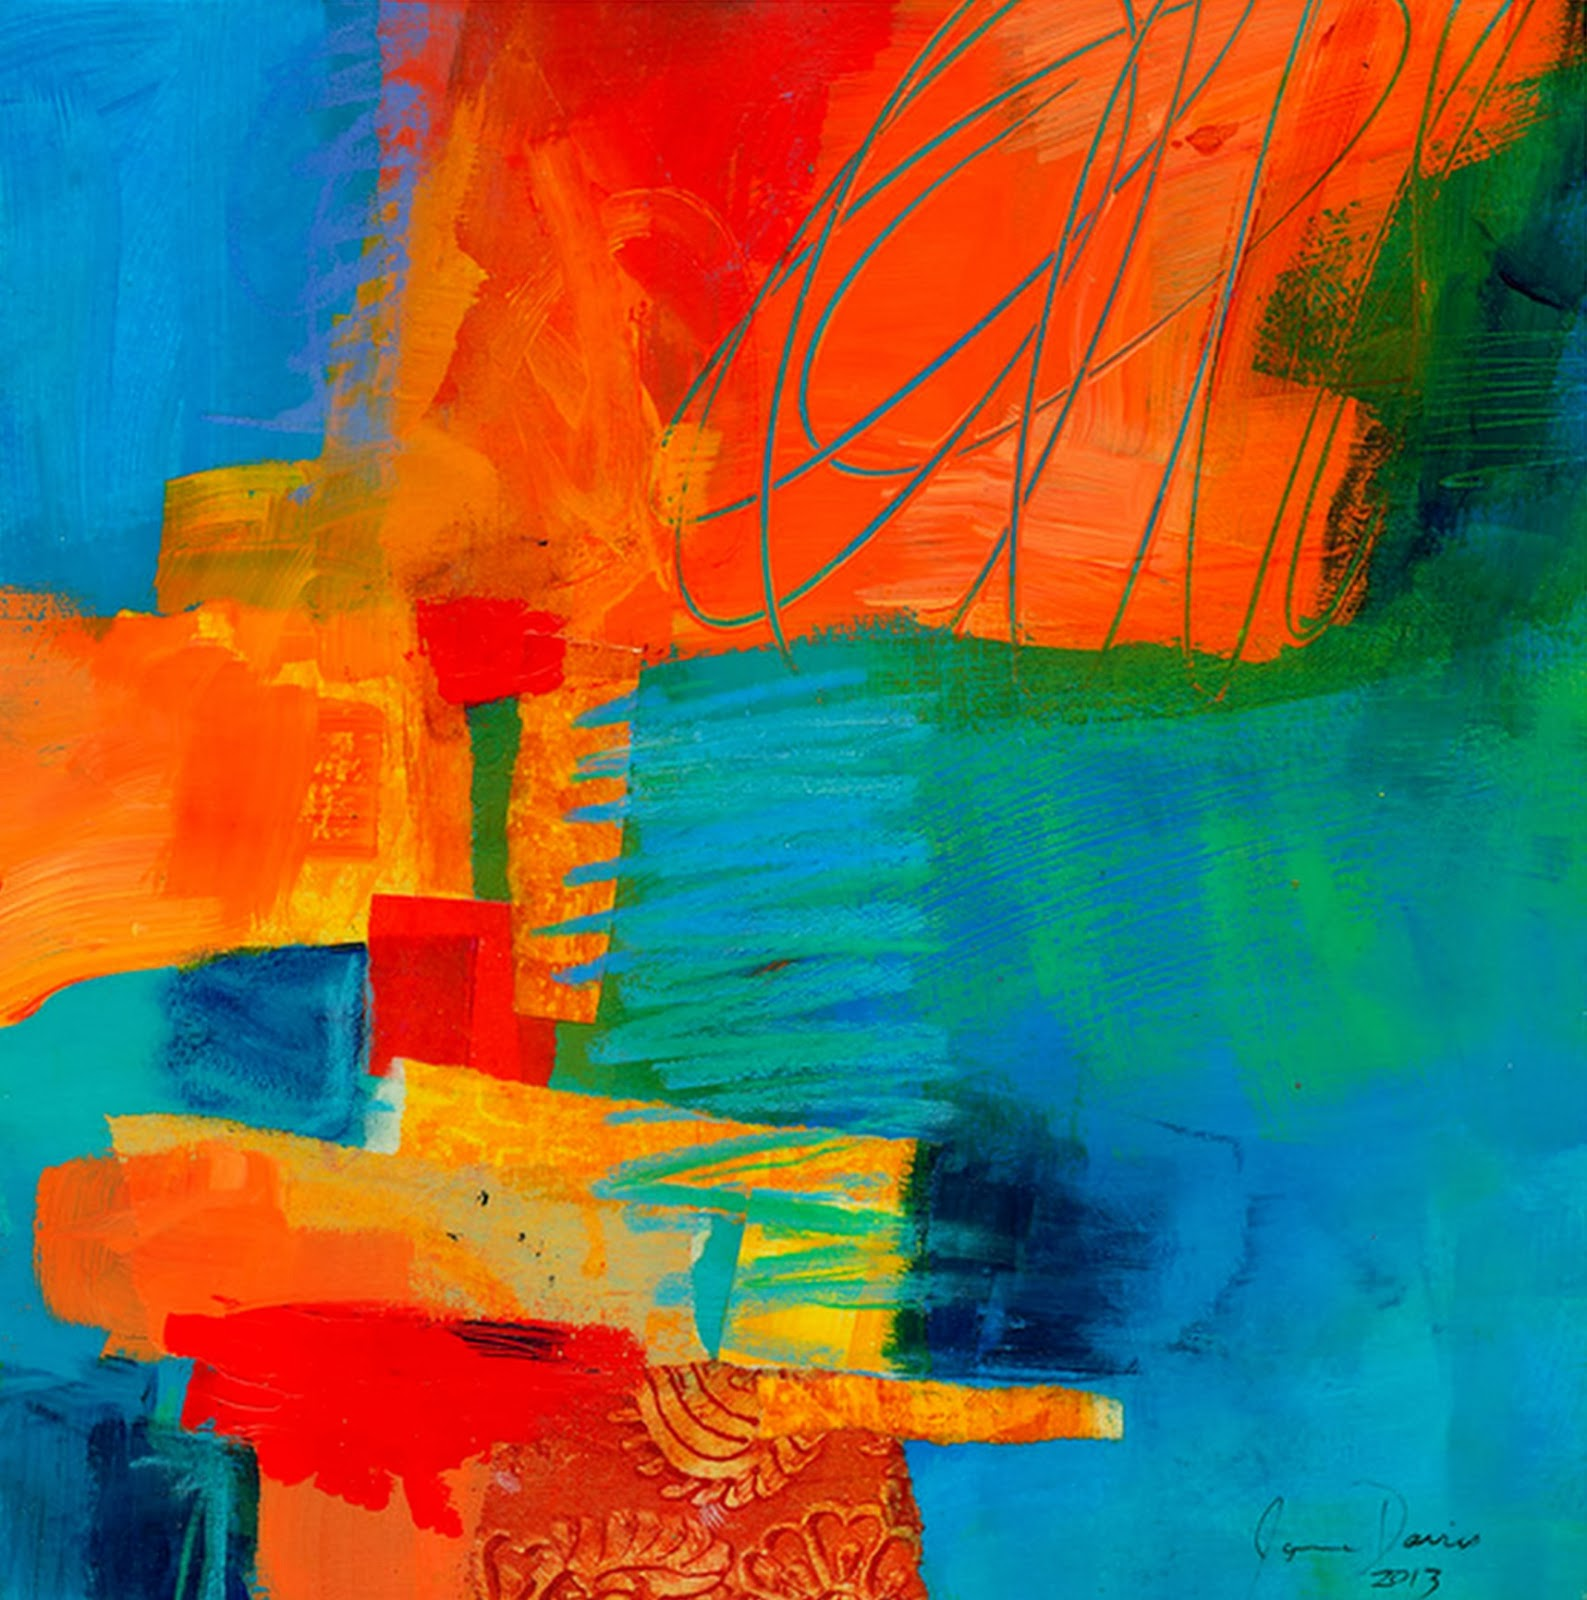 Pintura moderna y fotograf a art stica pintura abstracta for Pintura acrilica moderna